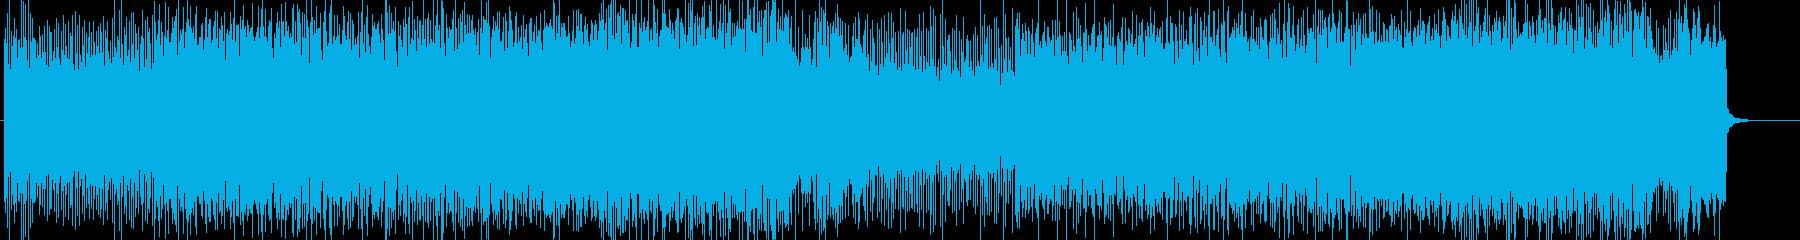 DEATH METAL、パワー188の再生済みの波形